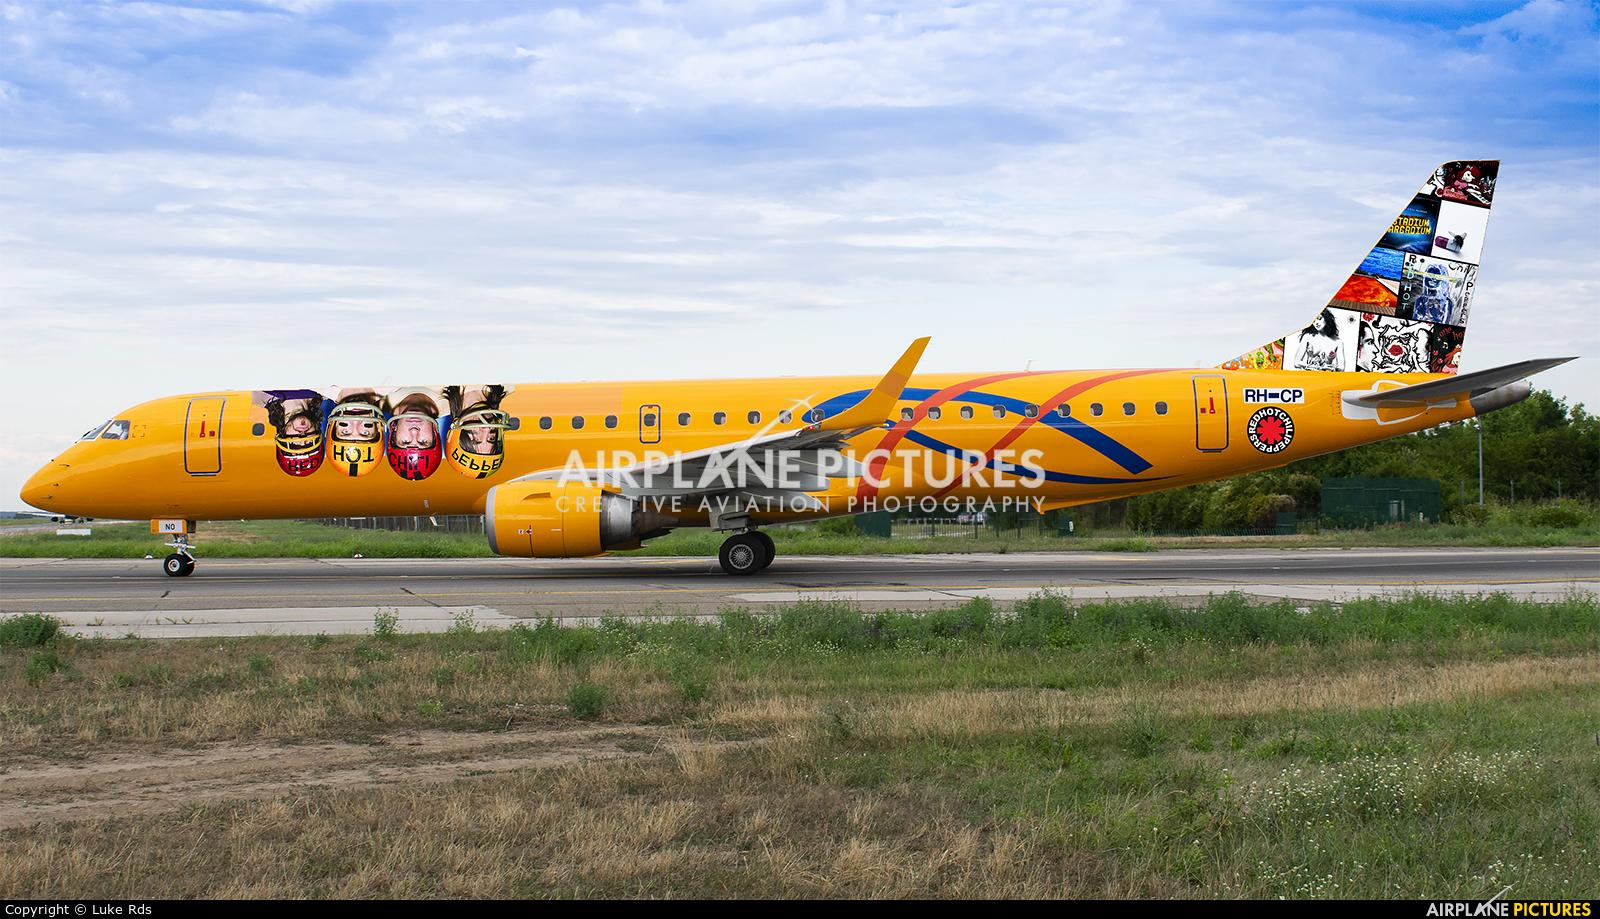 LOT - Polish Airlines SP-LNO aircraft at Bucharest - Henri Coandă